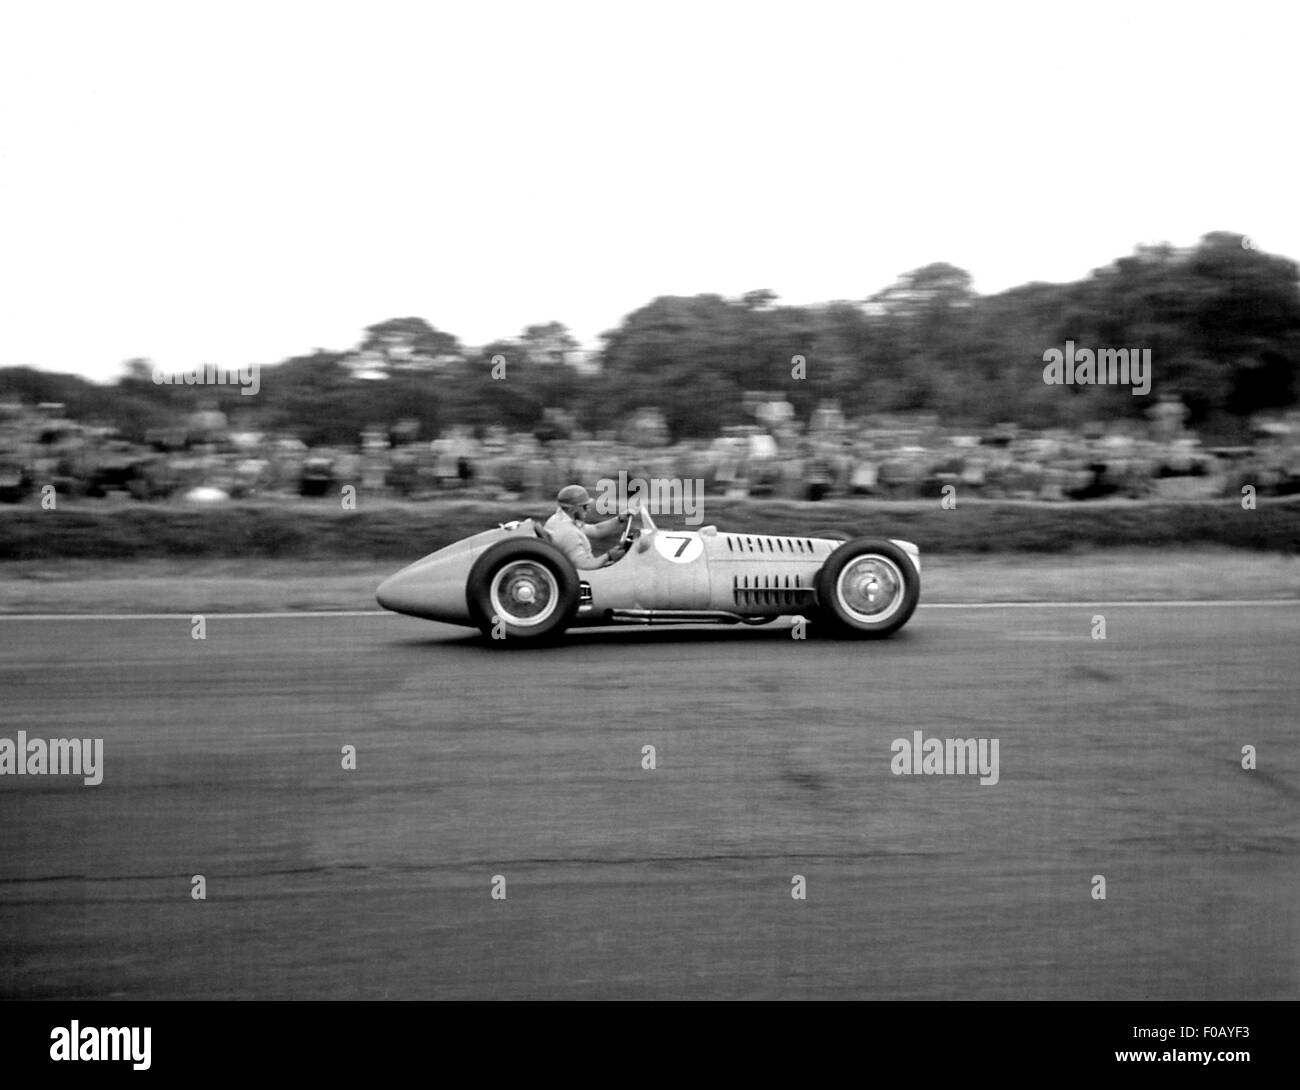 Formula Libre race at Silverstone 1952 - Stock Image